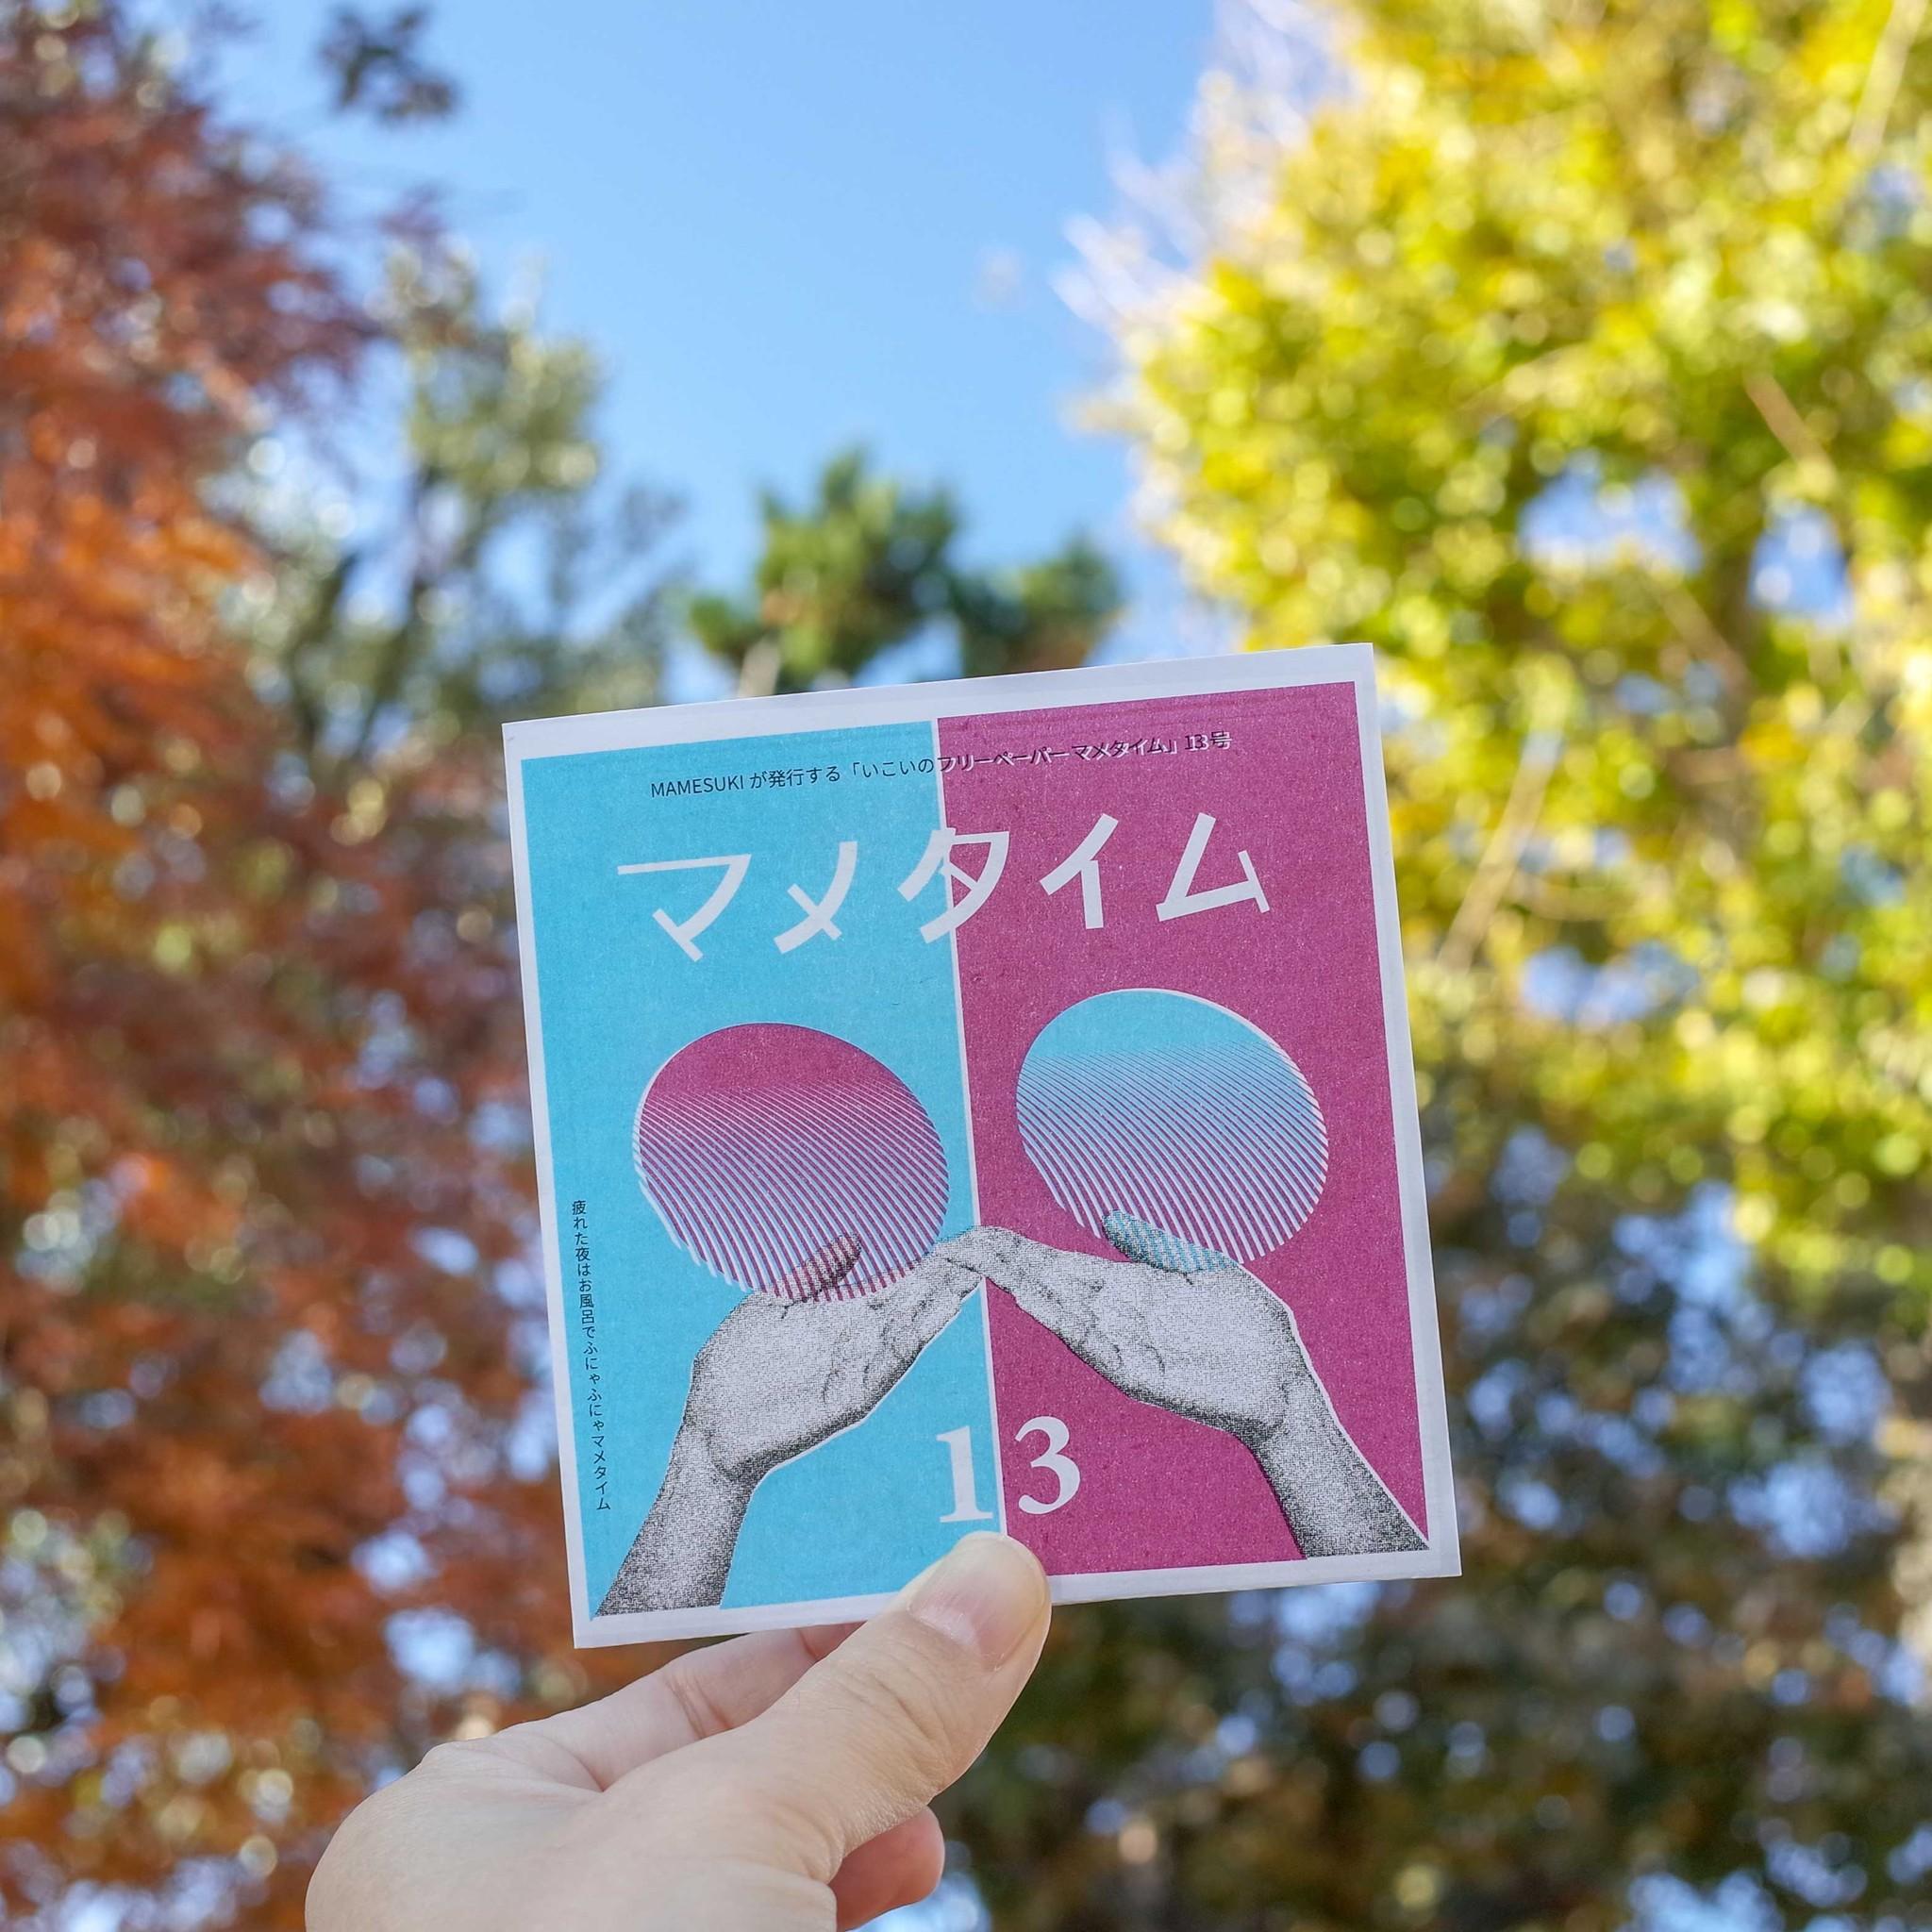 【MAMESUKI】のフリーペーパー「いこいのフリーペーパー マメタイム」13号 発刊